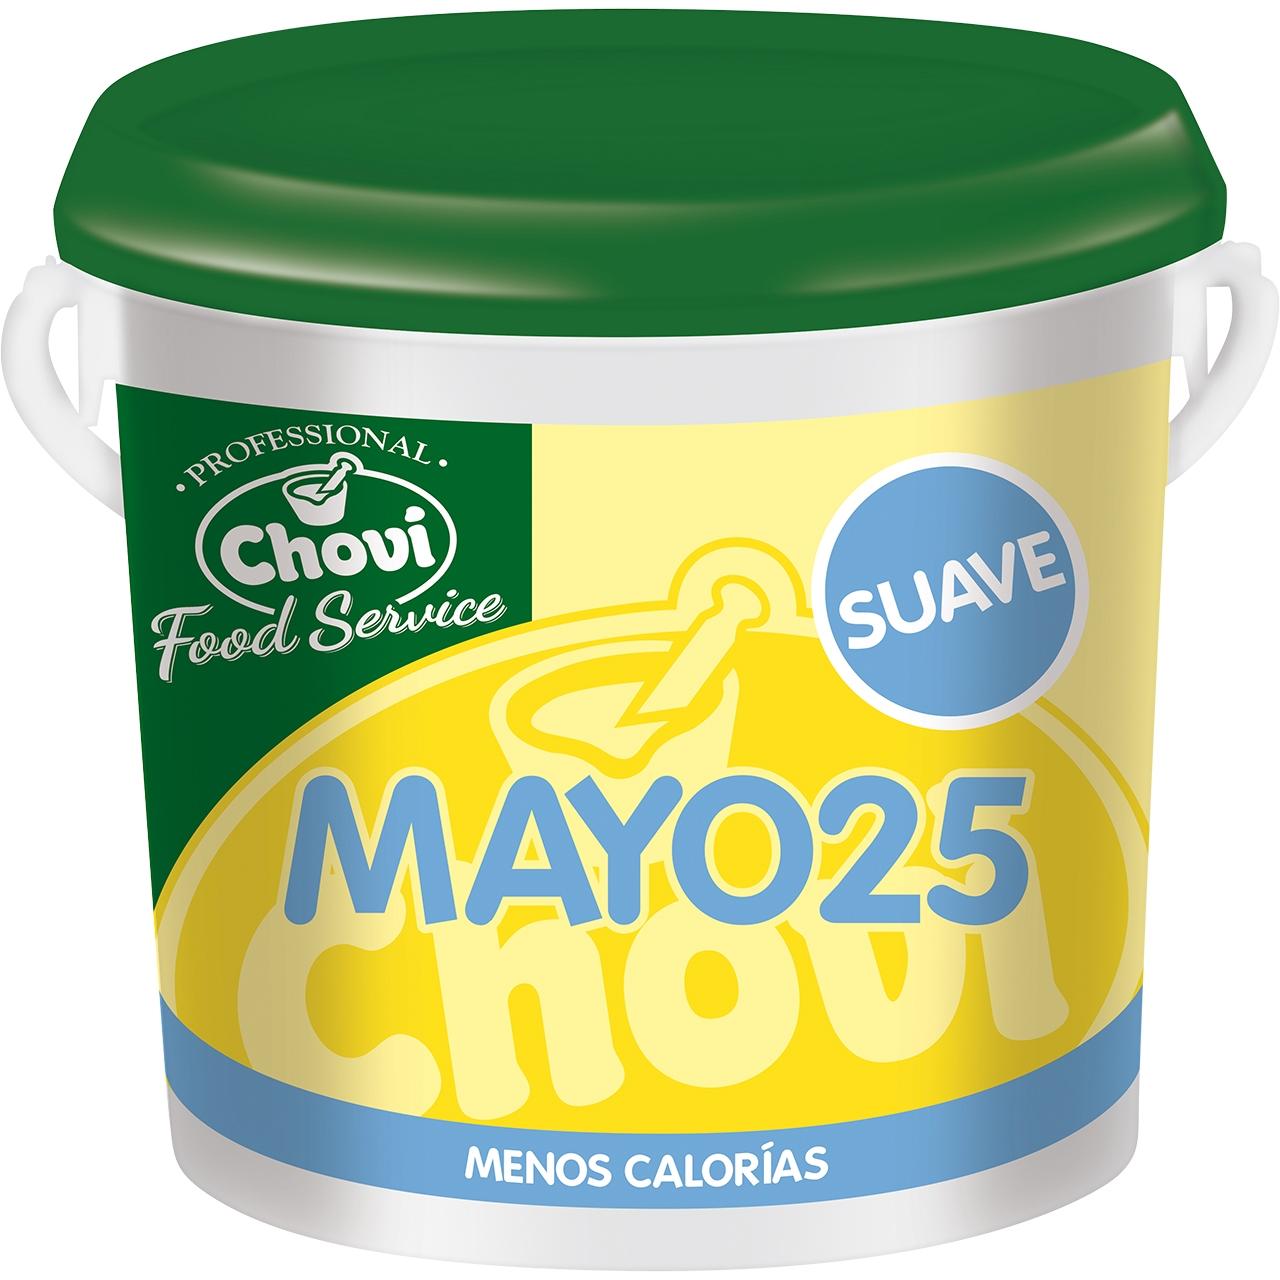 Mayo 25 salsa fina especial hosteleria 10l. Choví